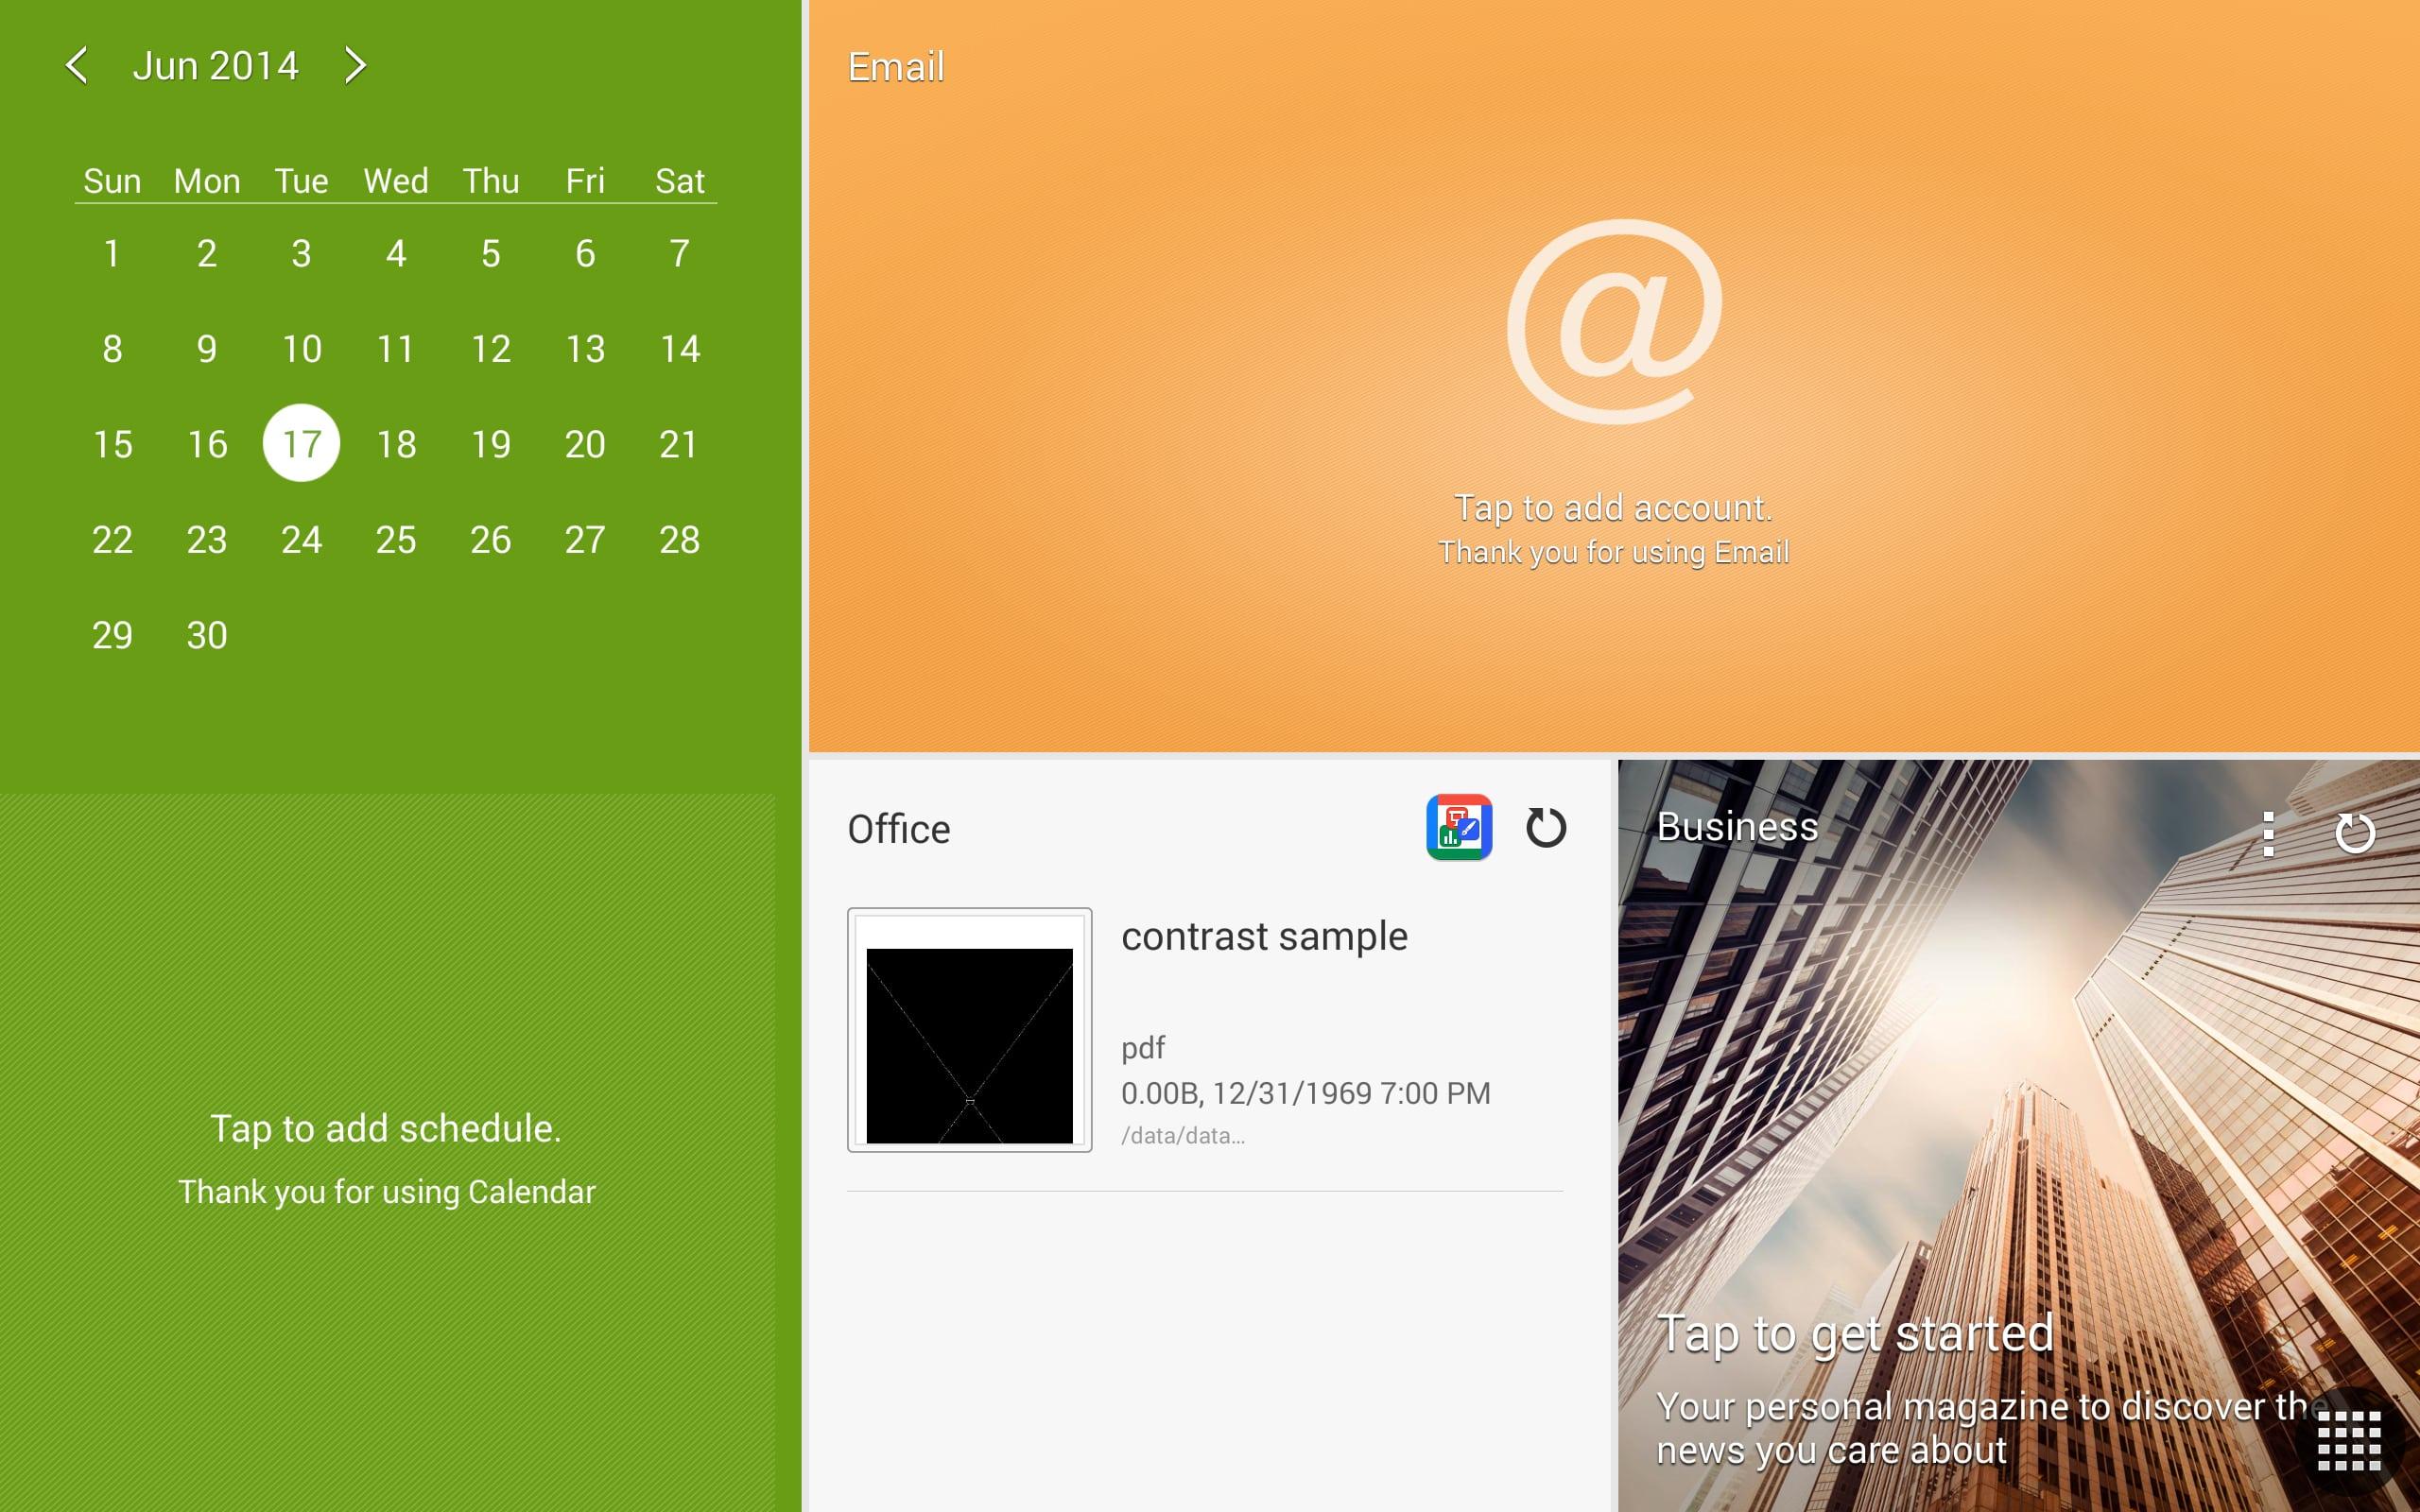 A screenshot of the Samsung Galaxy Note Pro's calendar screen.